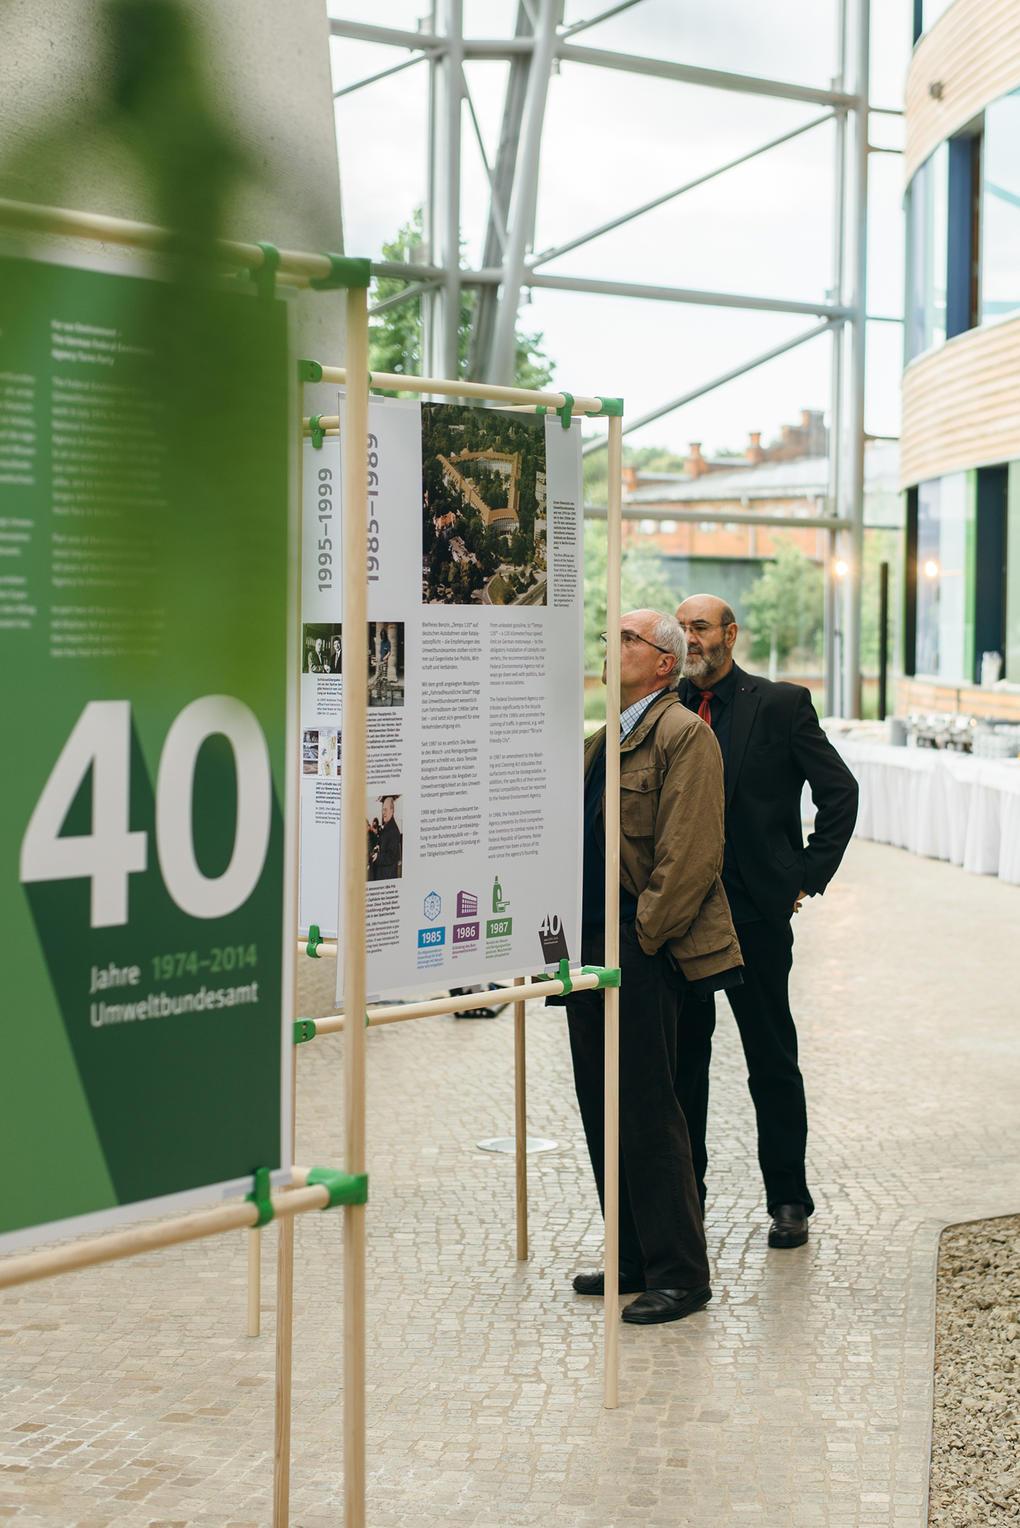 40JahreUBA_Ausstellung02